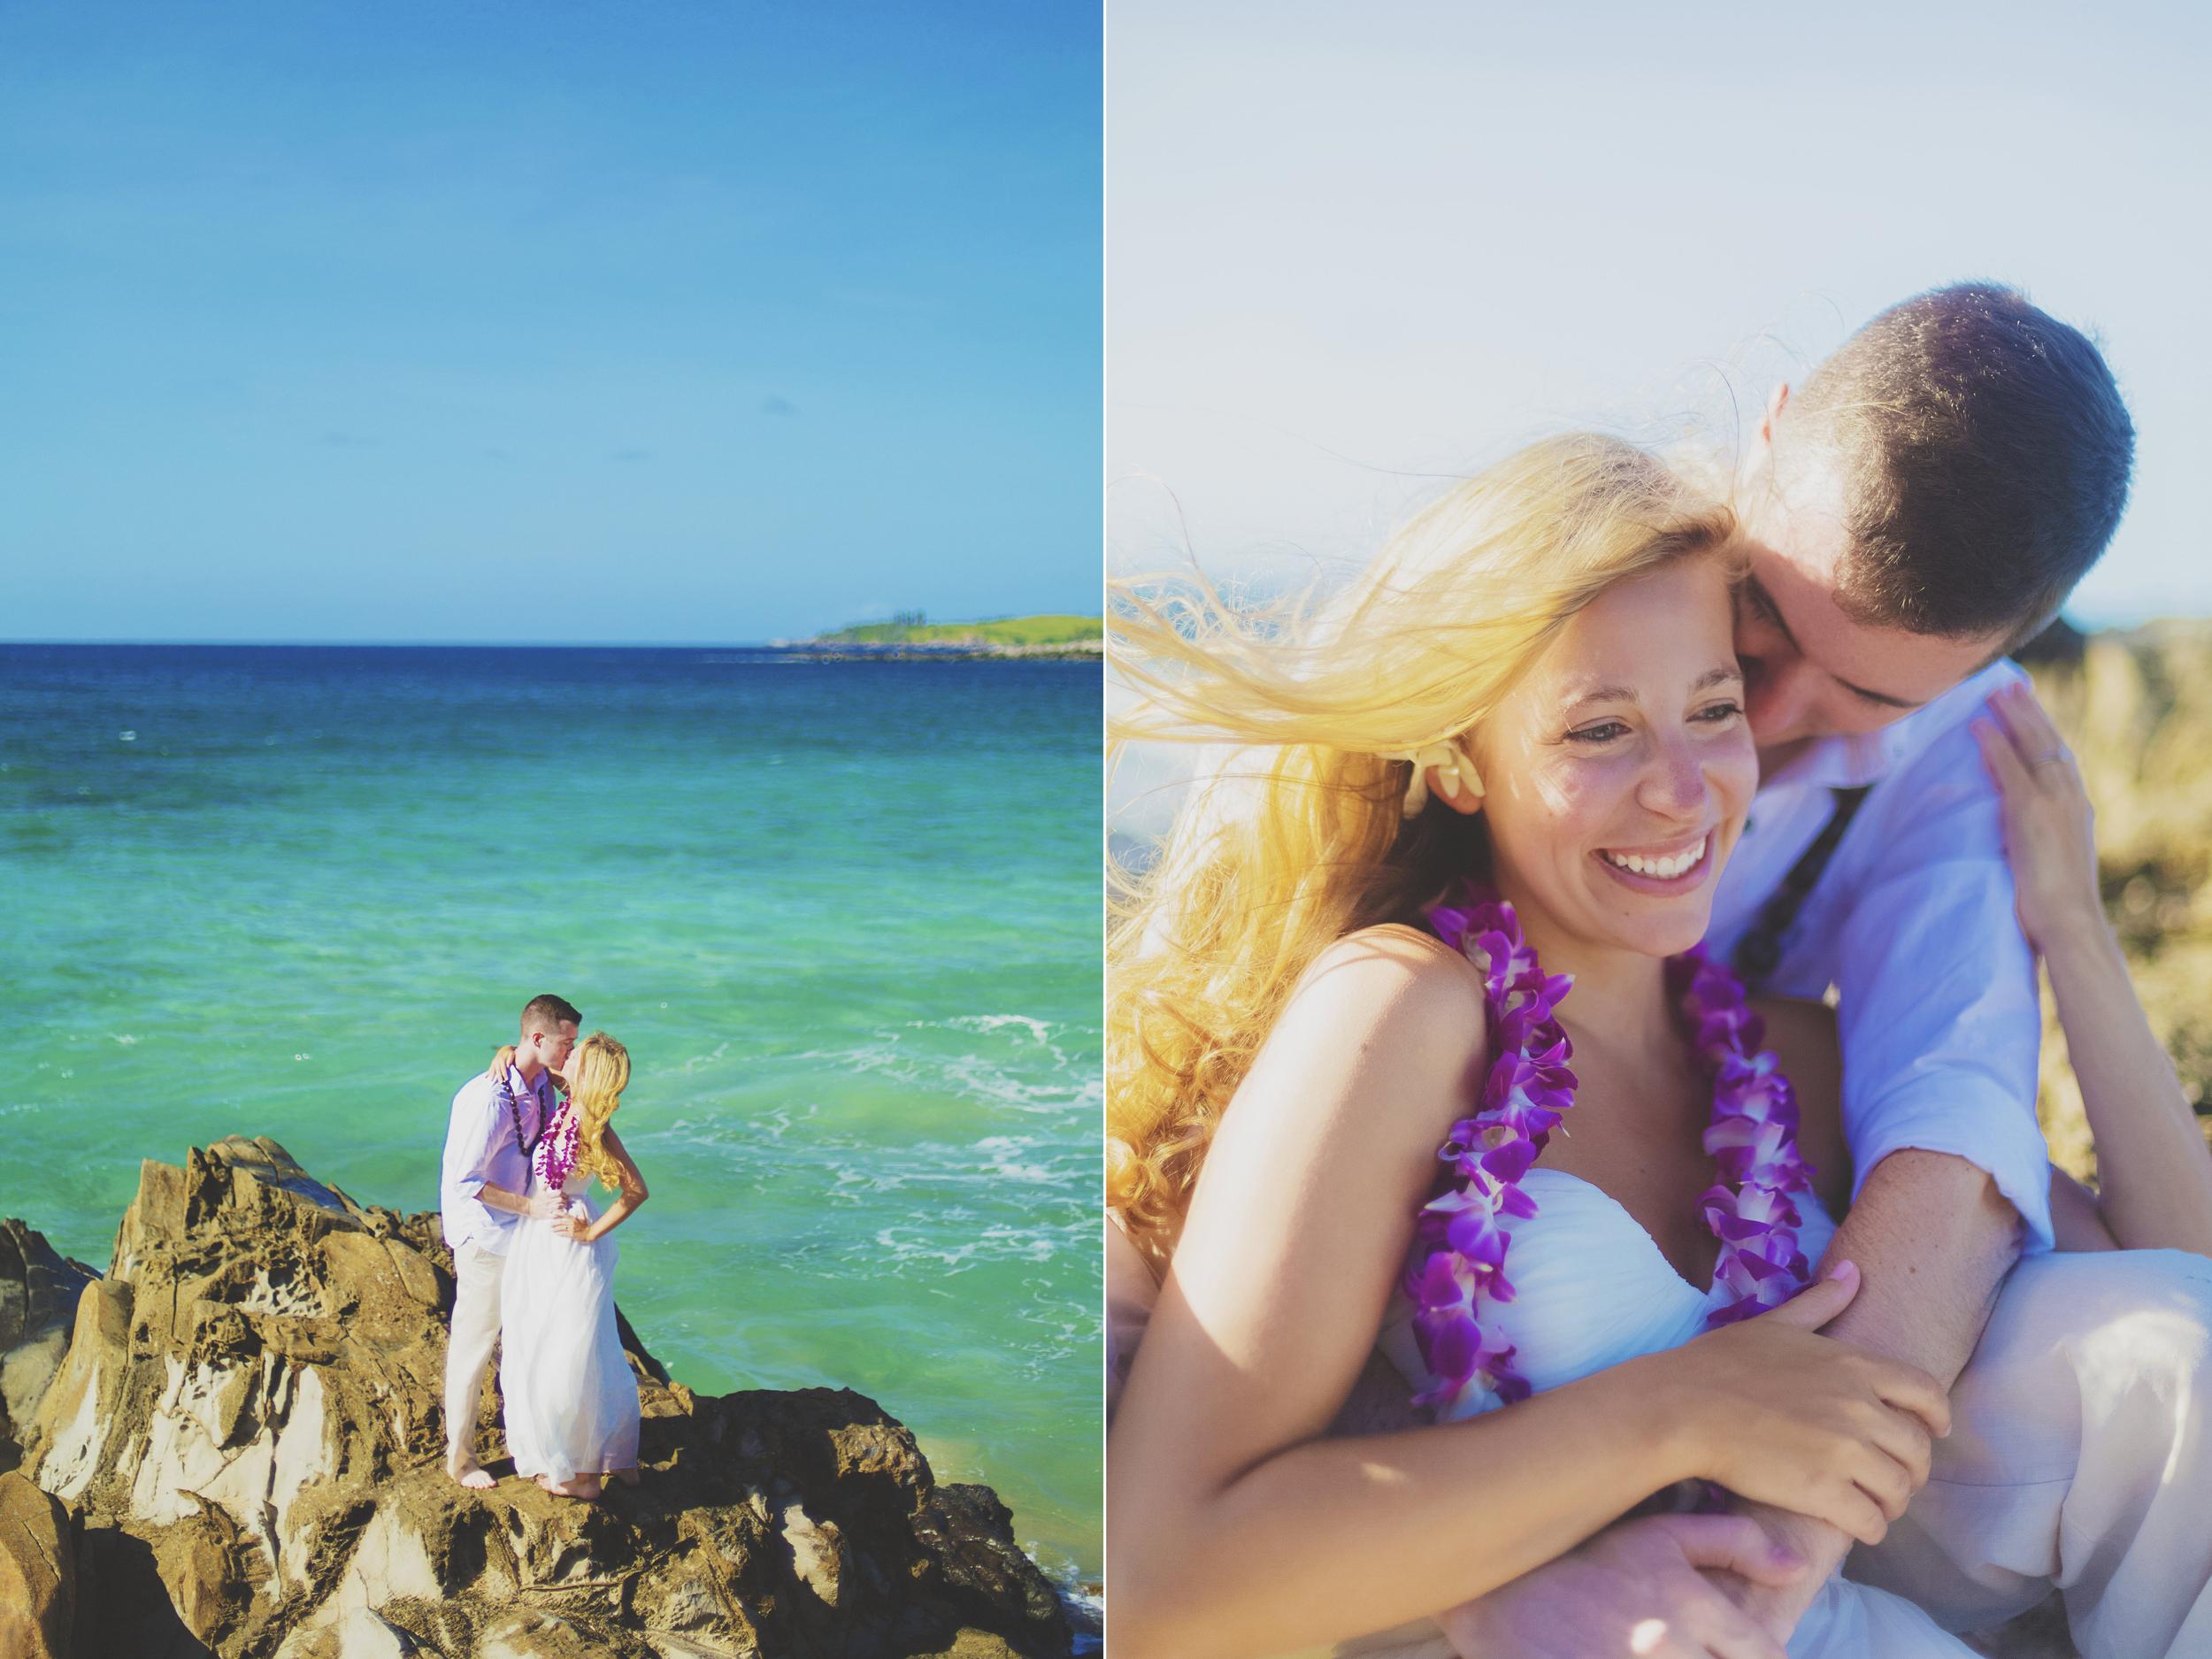 angie-diaz-photography-maui-honeymoon-hawaii-elopement-15.jpg